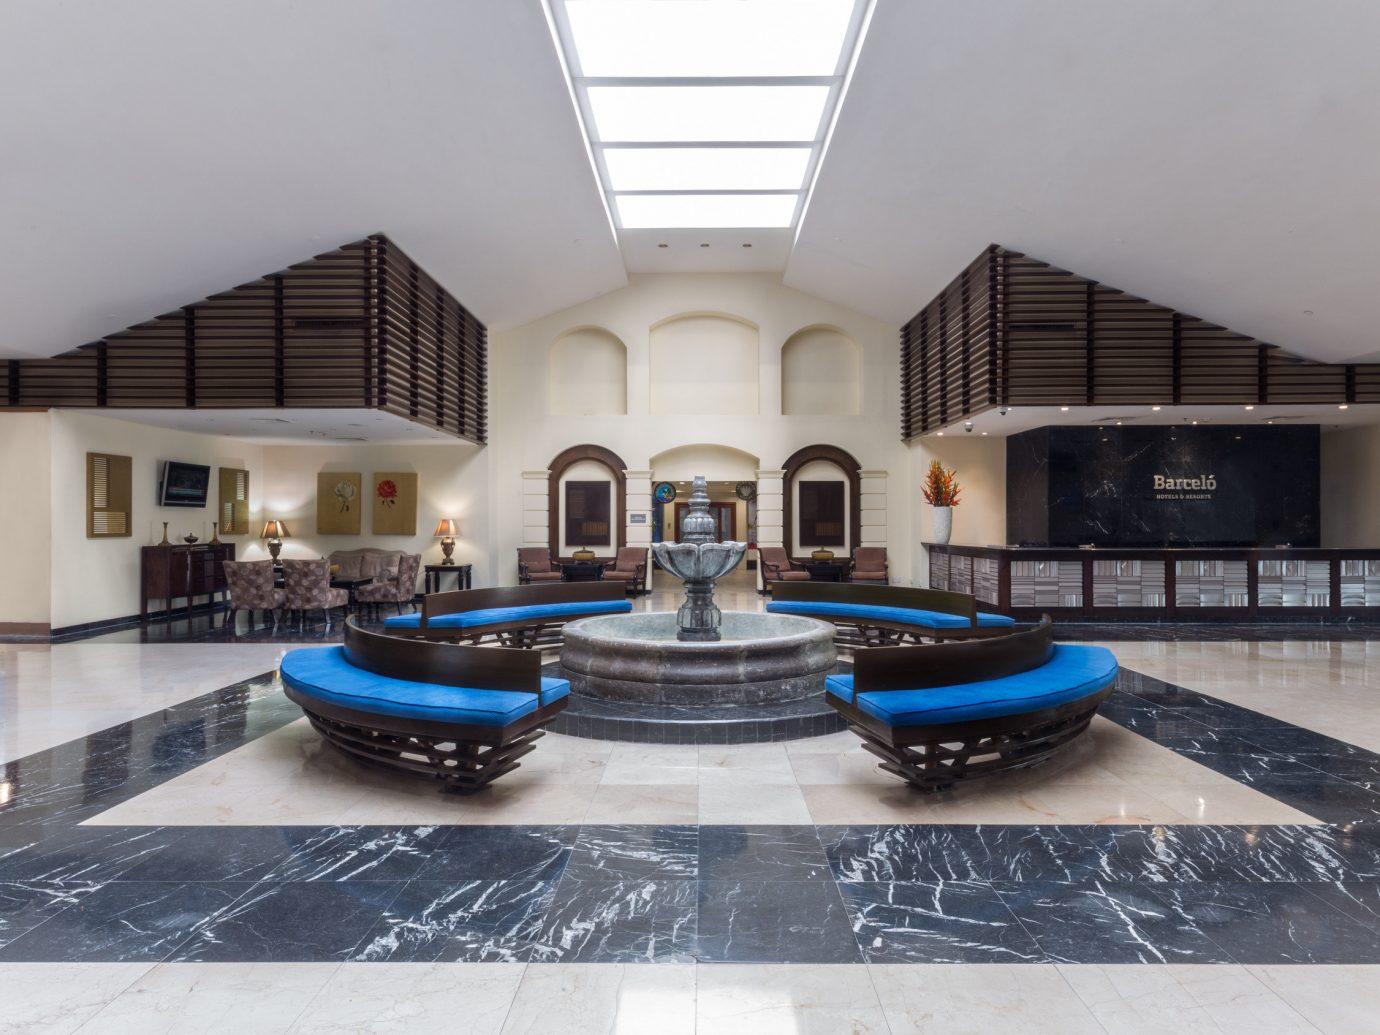 Hotels indoor property room blue floor estate ceiling Lobby interior design mansion flooring